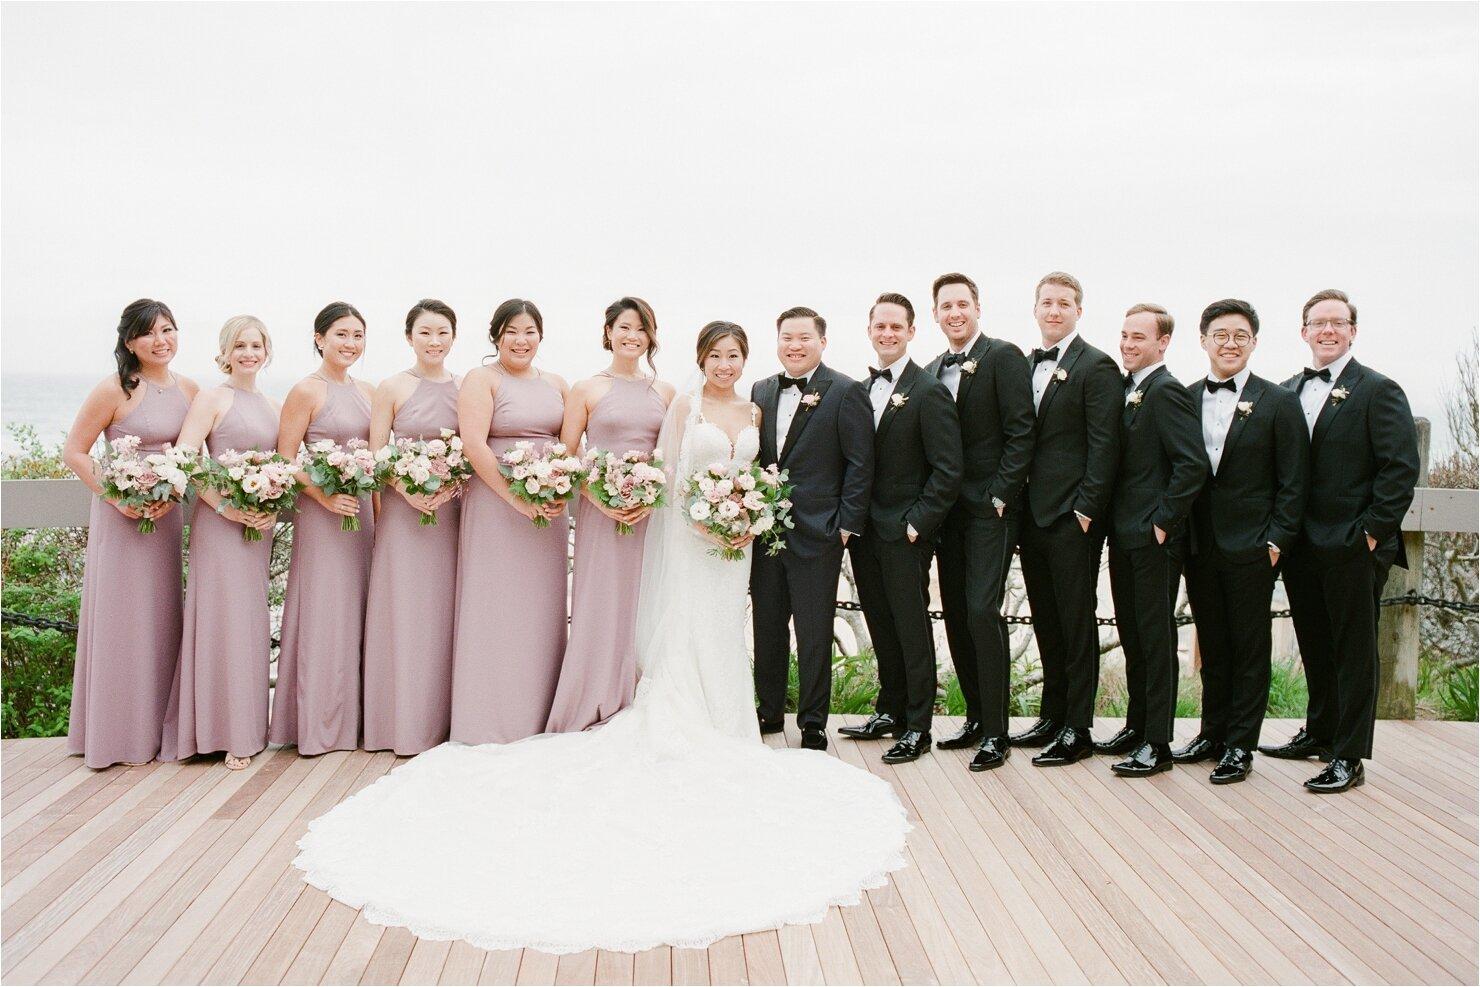 Full Bridal Party Photos at Gurney's Montauk